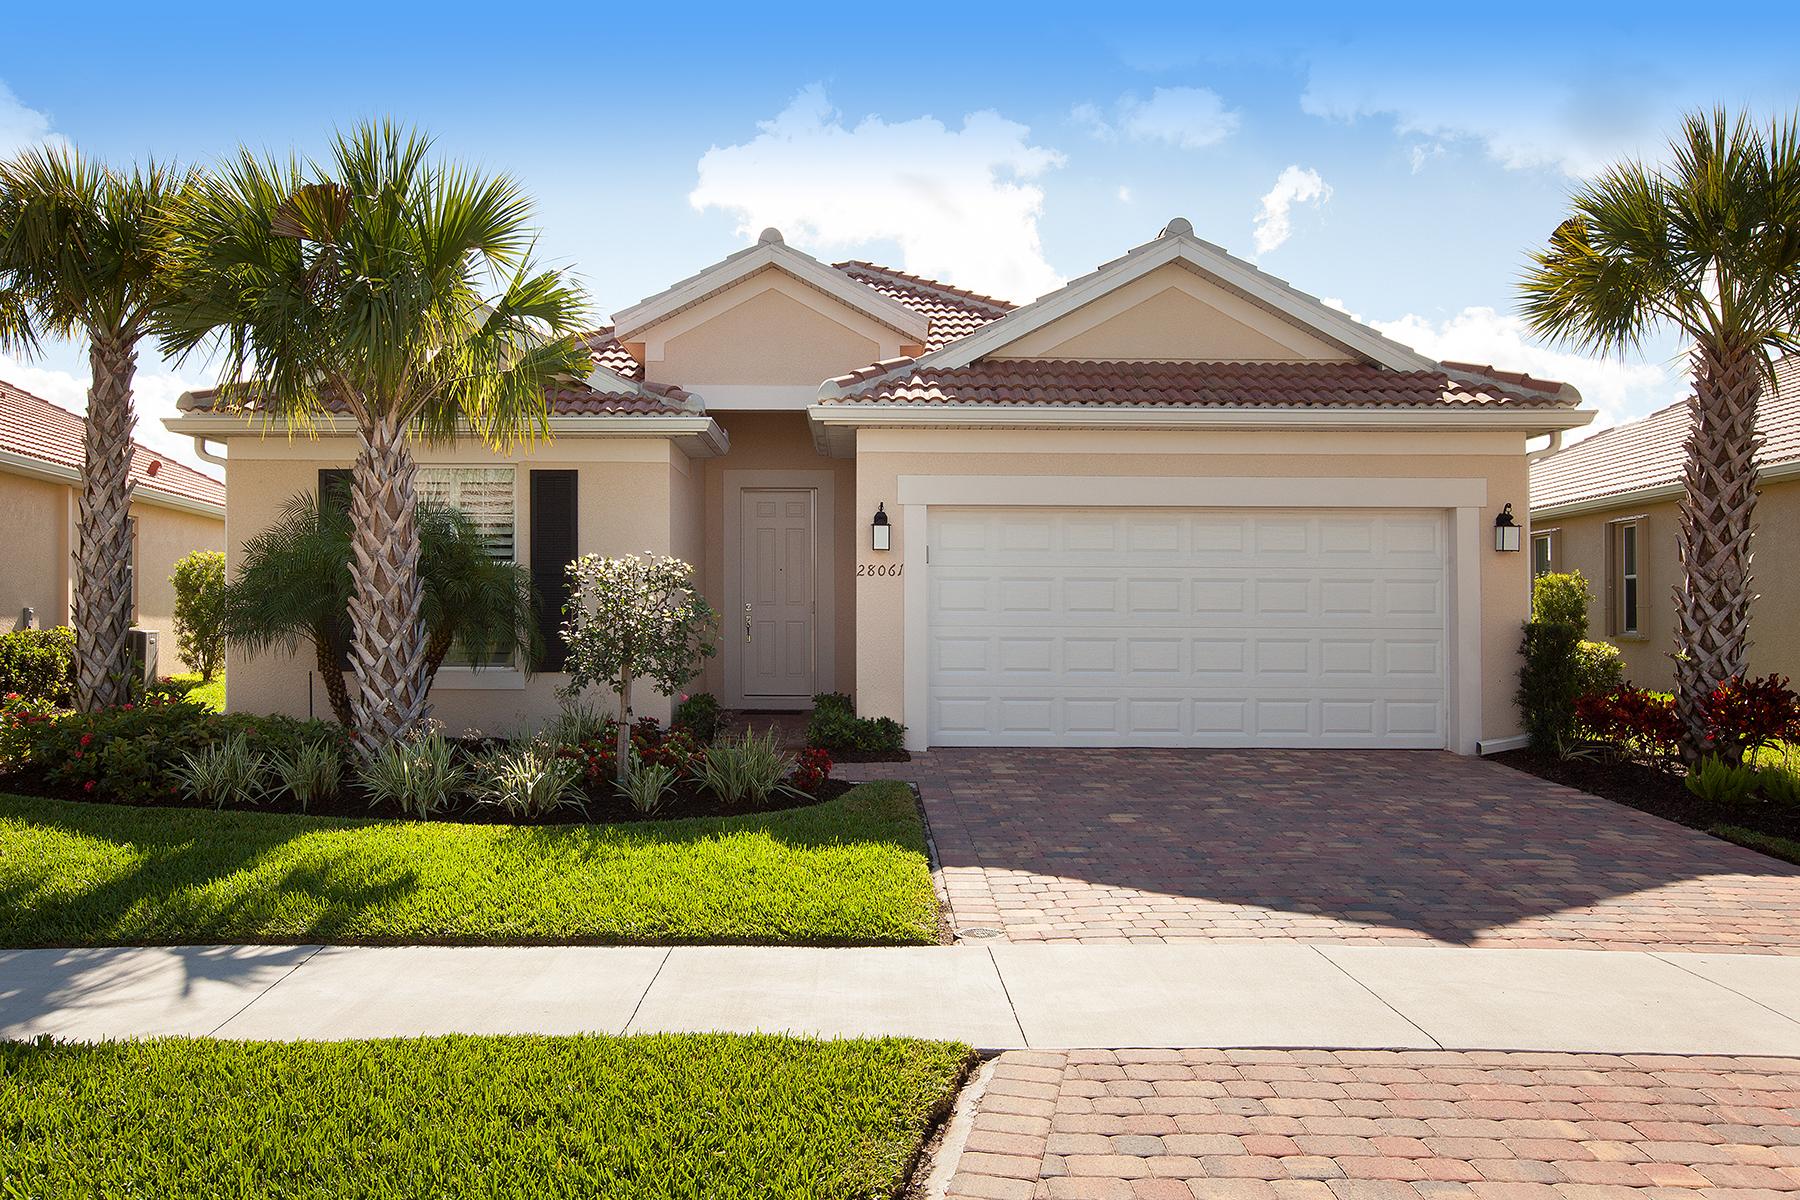 sales property at 28061 Quiet Water Way , Bonita Springs, FL 34135